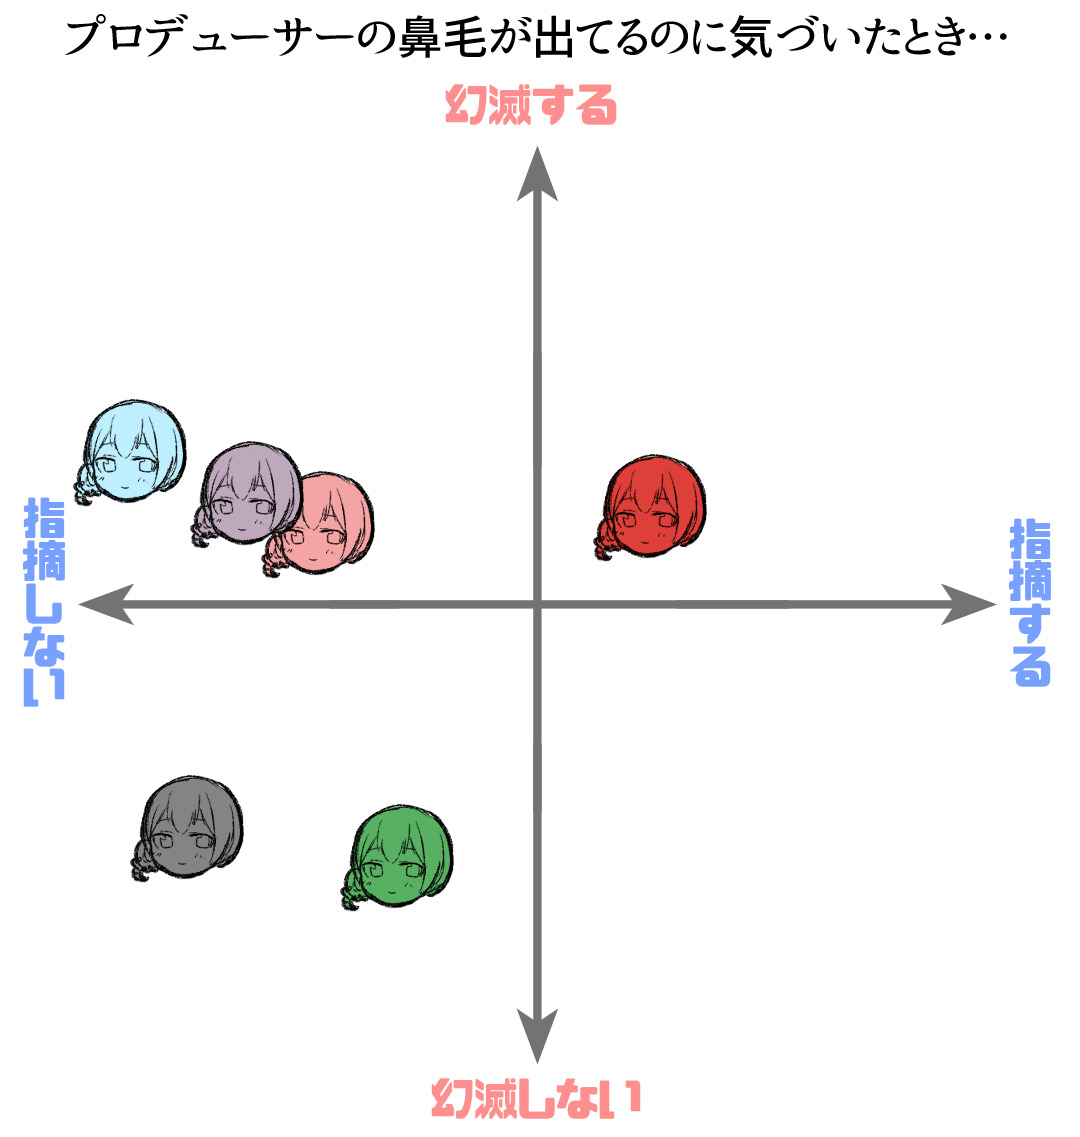 f:id:hoshi_sano:20200414113053j:image:w400